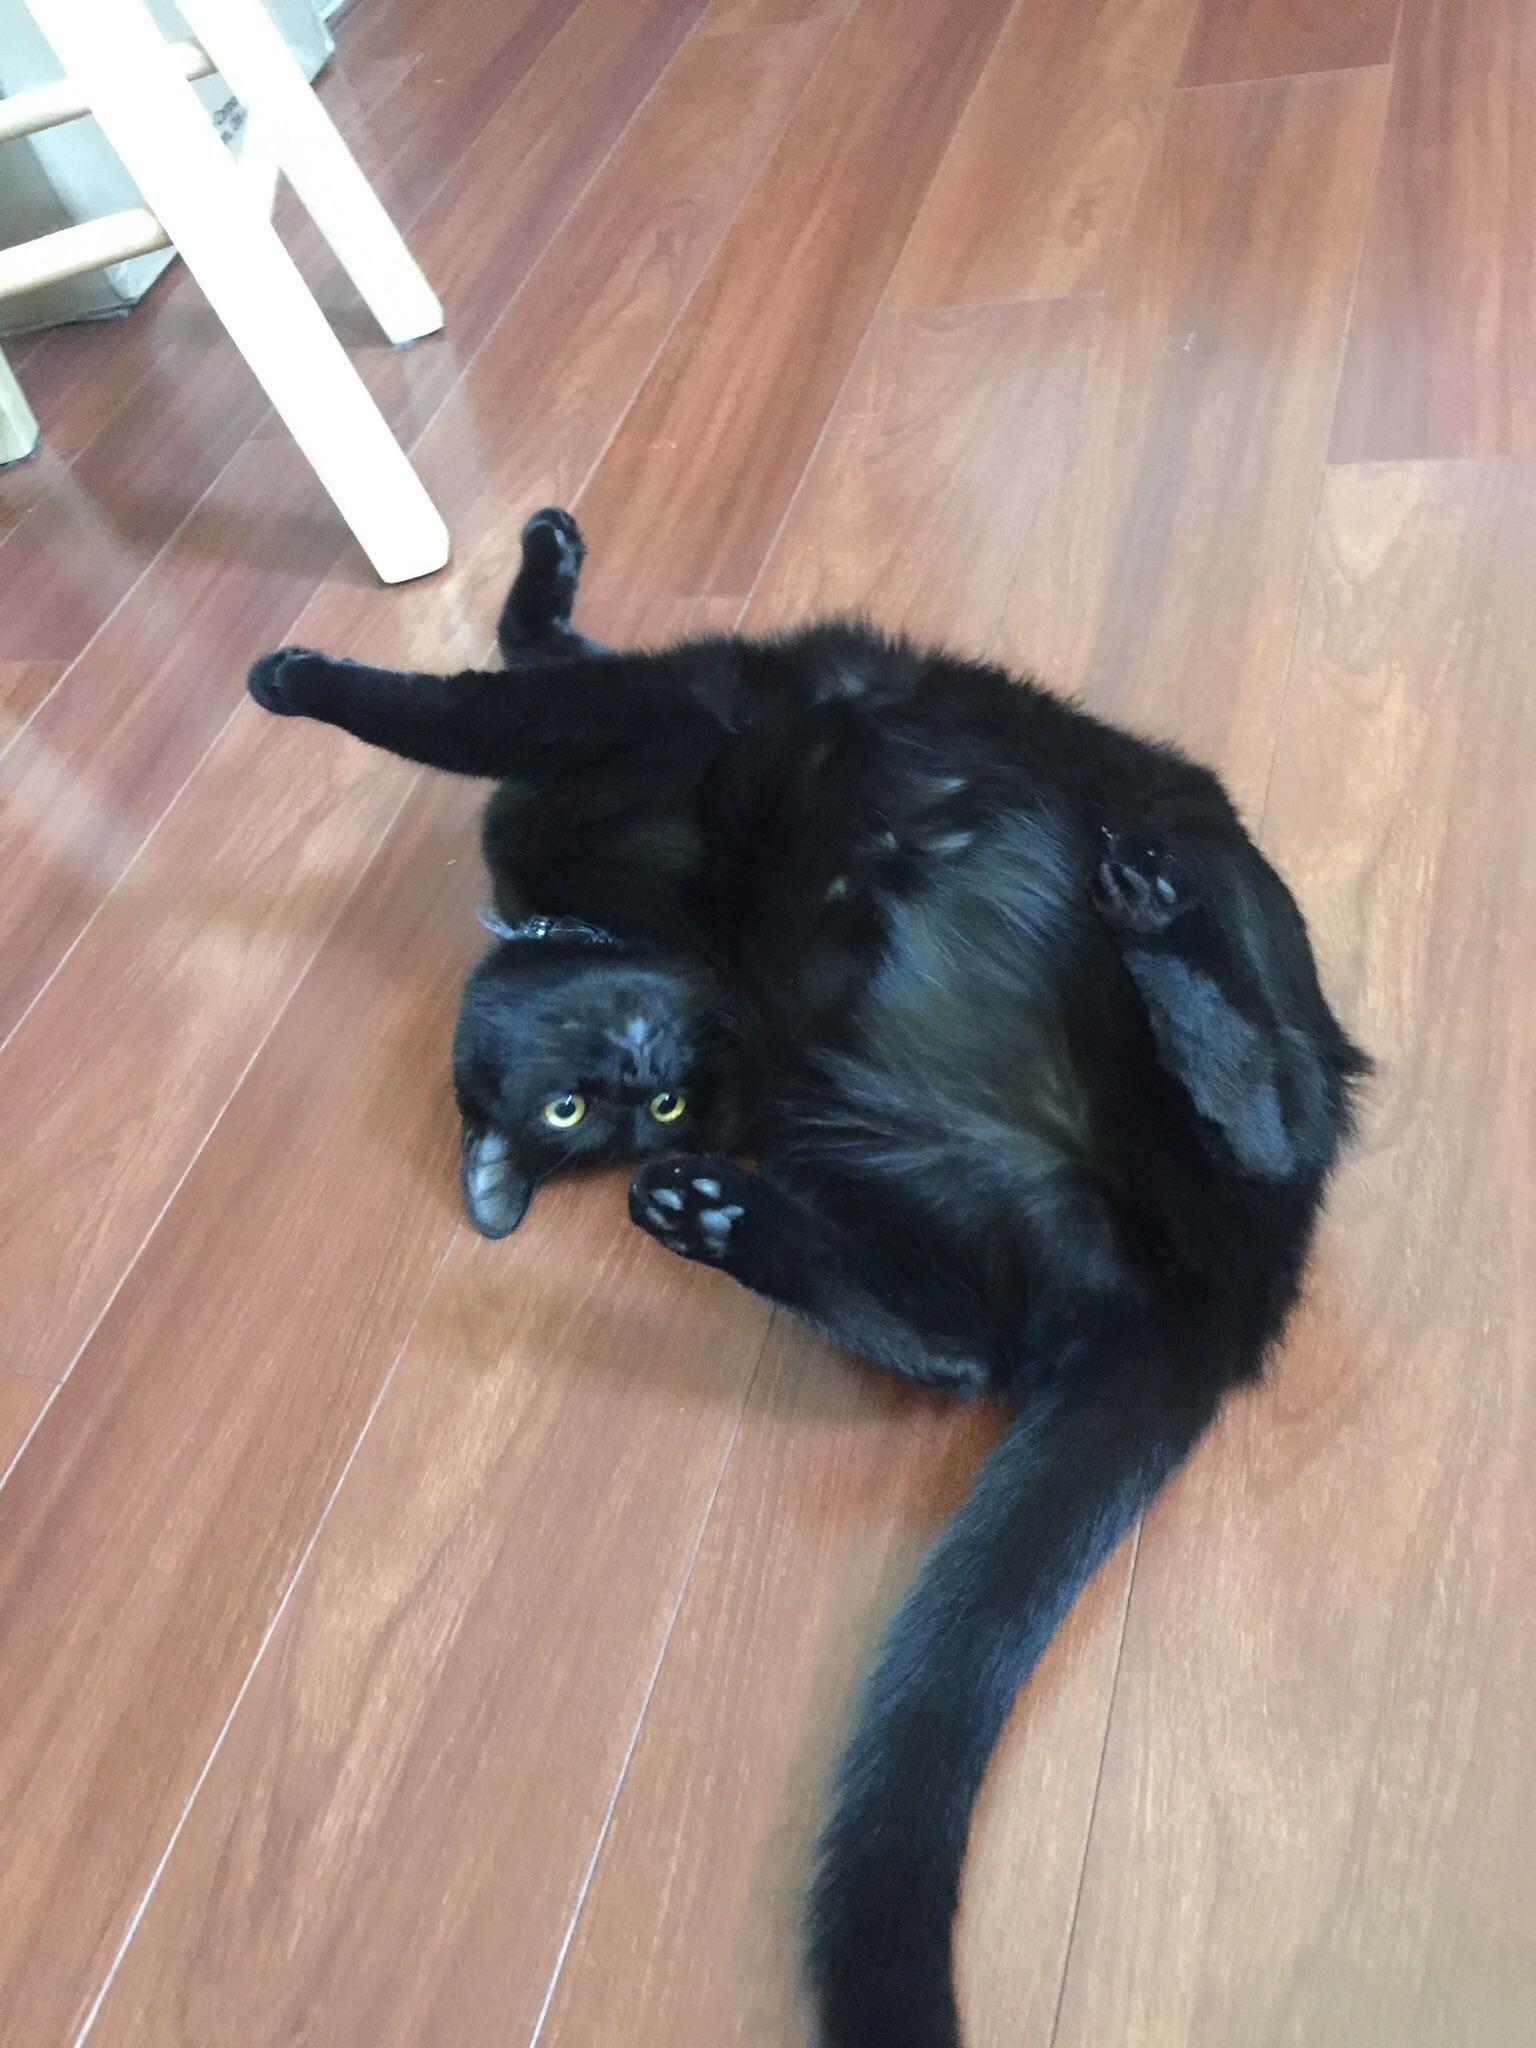 My Kitty Luna Was Flopping Around On The Floor Kitty Animals Flop